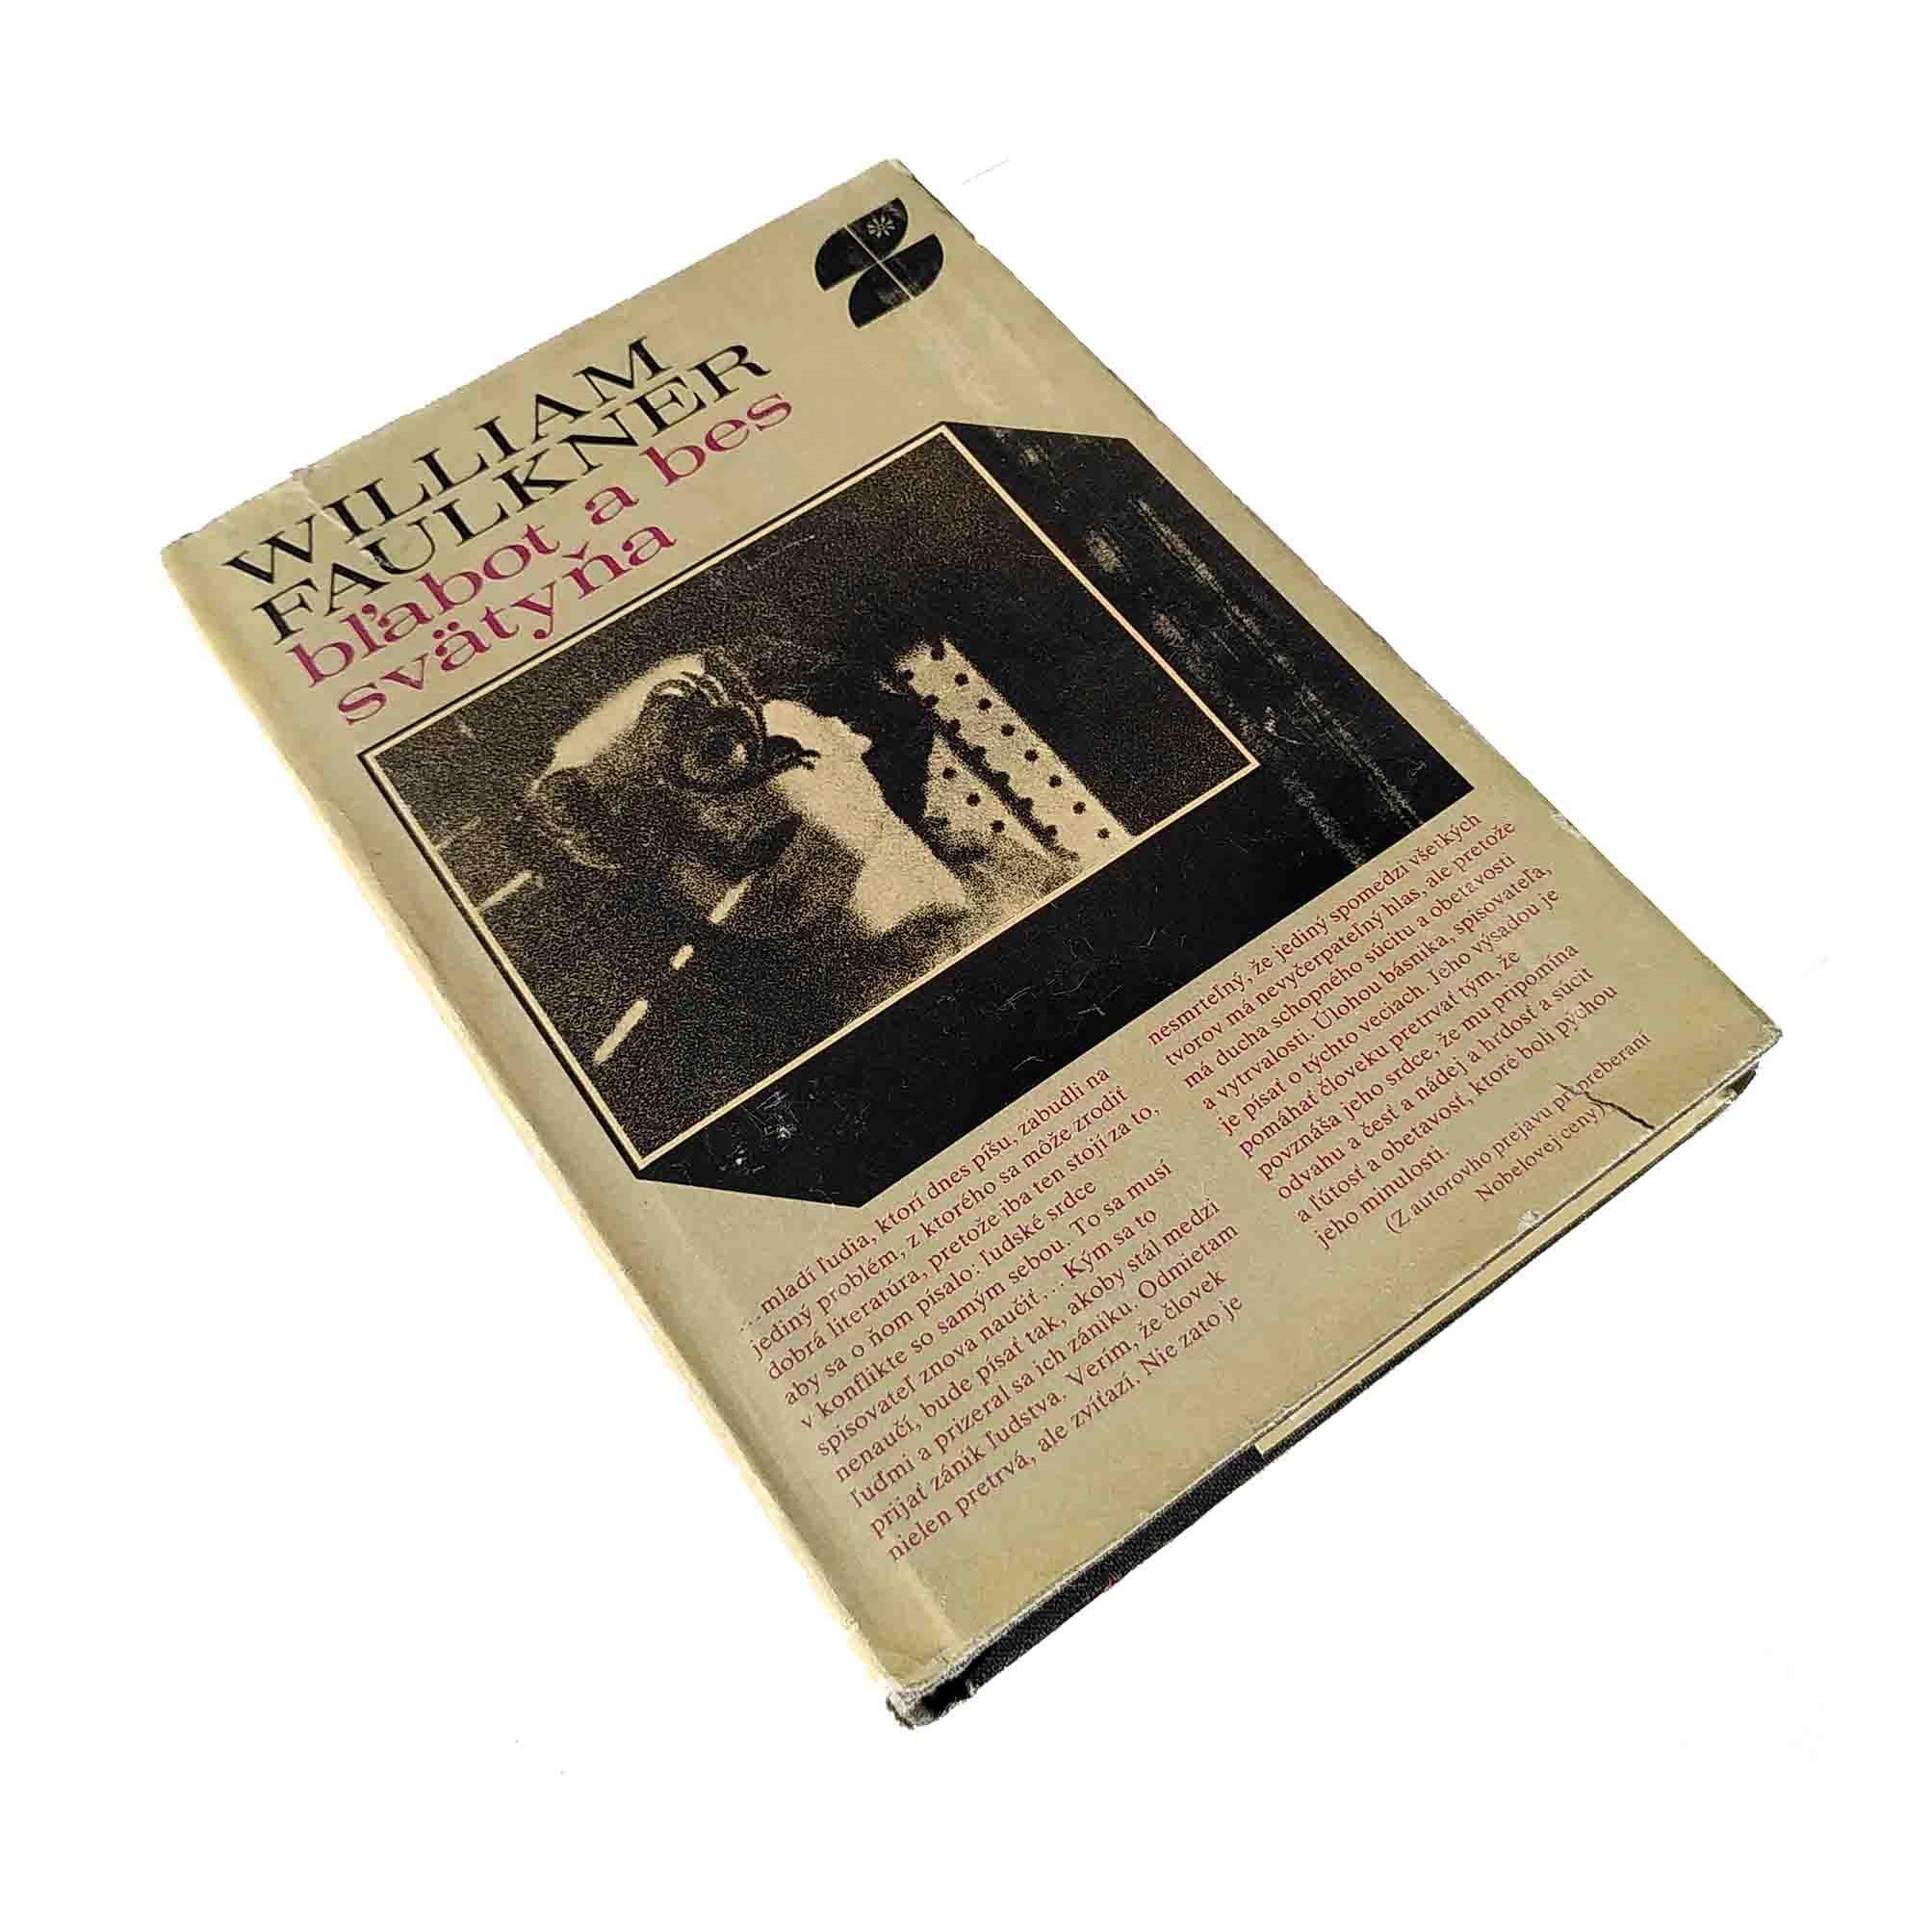 5915-Faulkner-Sound-Fury-Slovak-First-Edition-1978-Dust-Jacket-recto-free-N.jpg